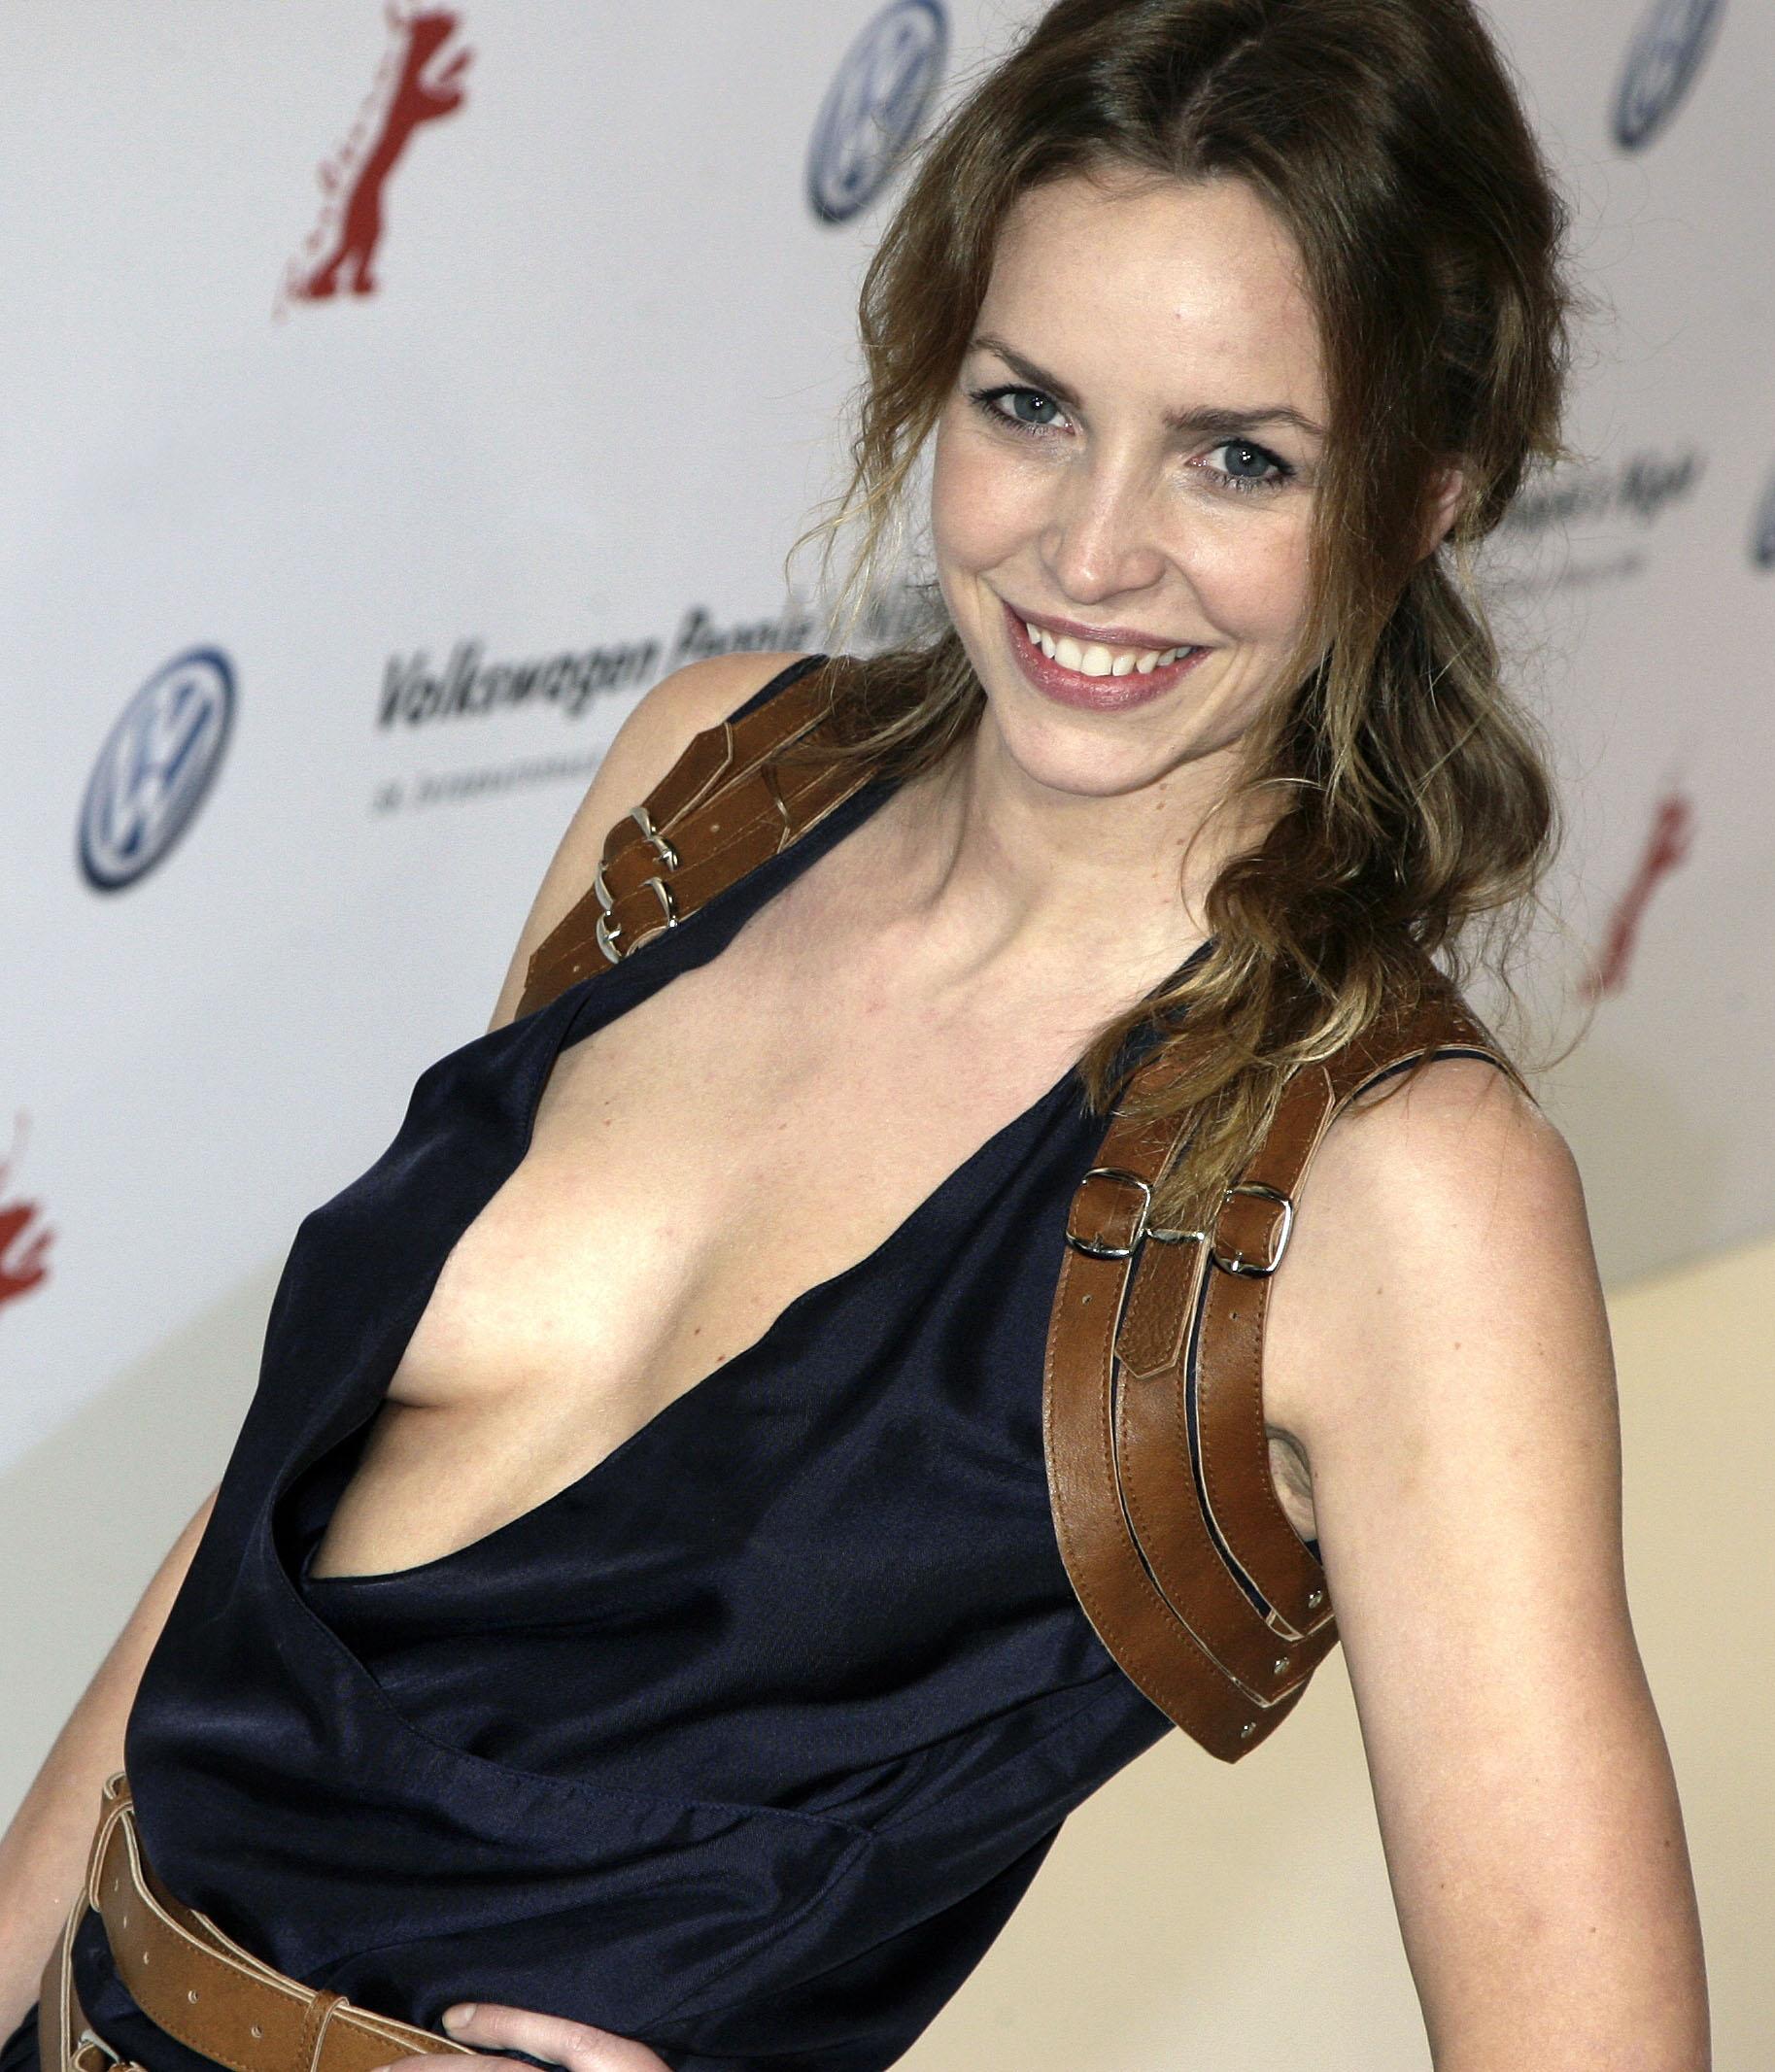 Simone Hanselmann Nackt. Foto - 1